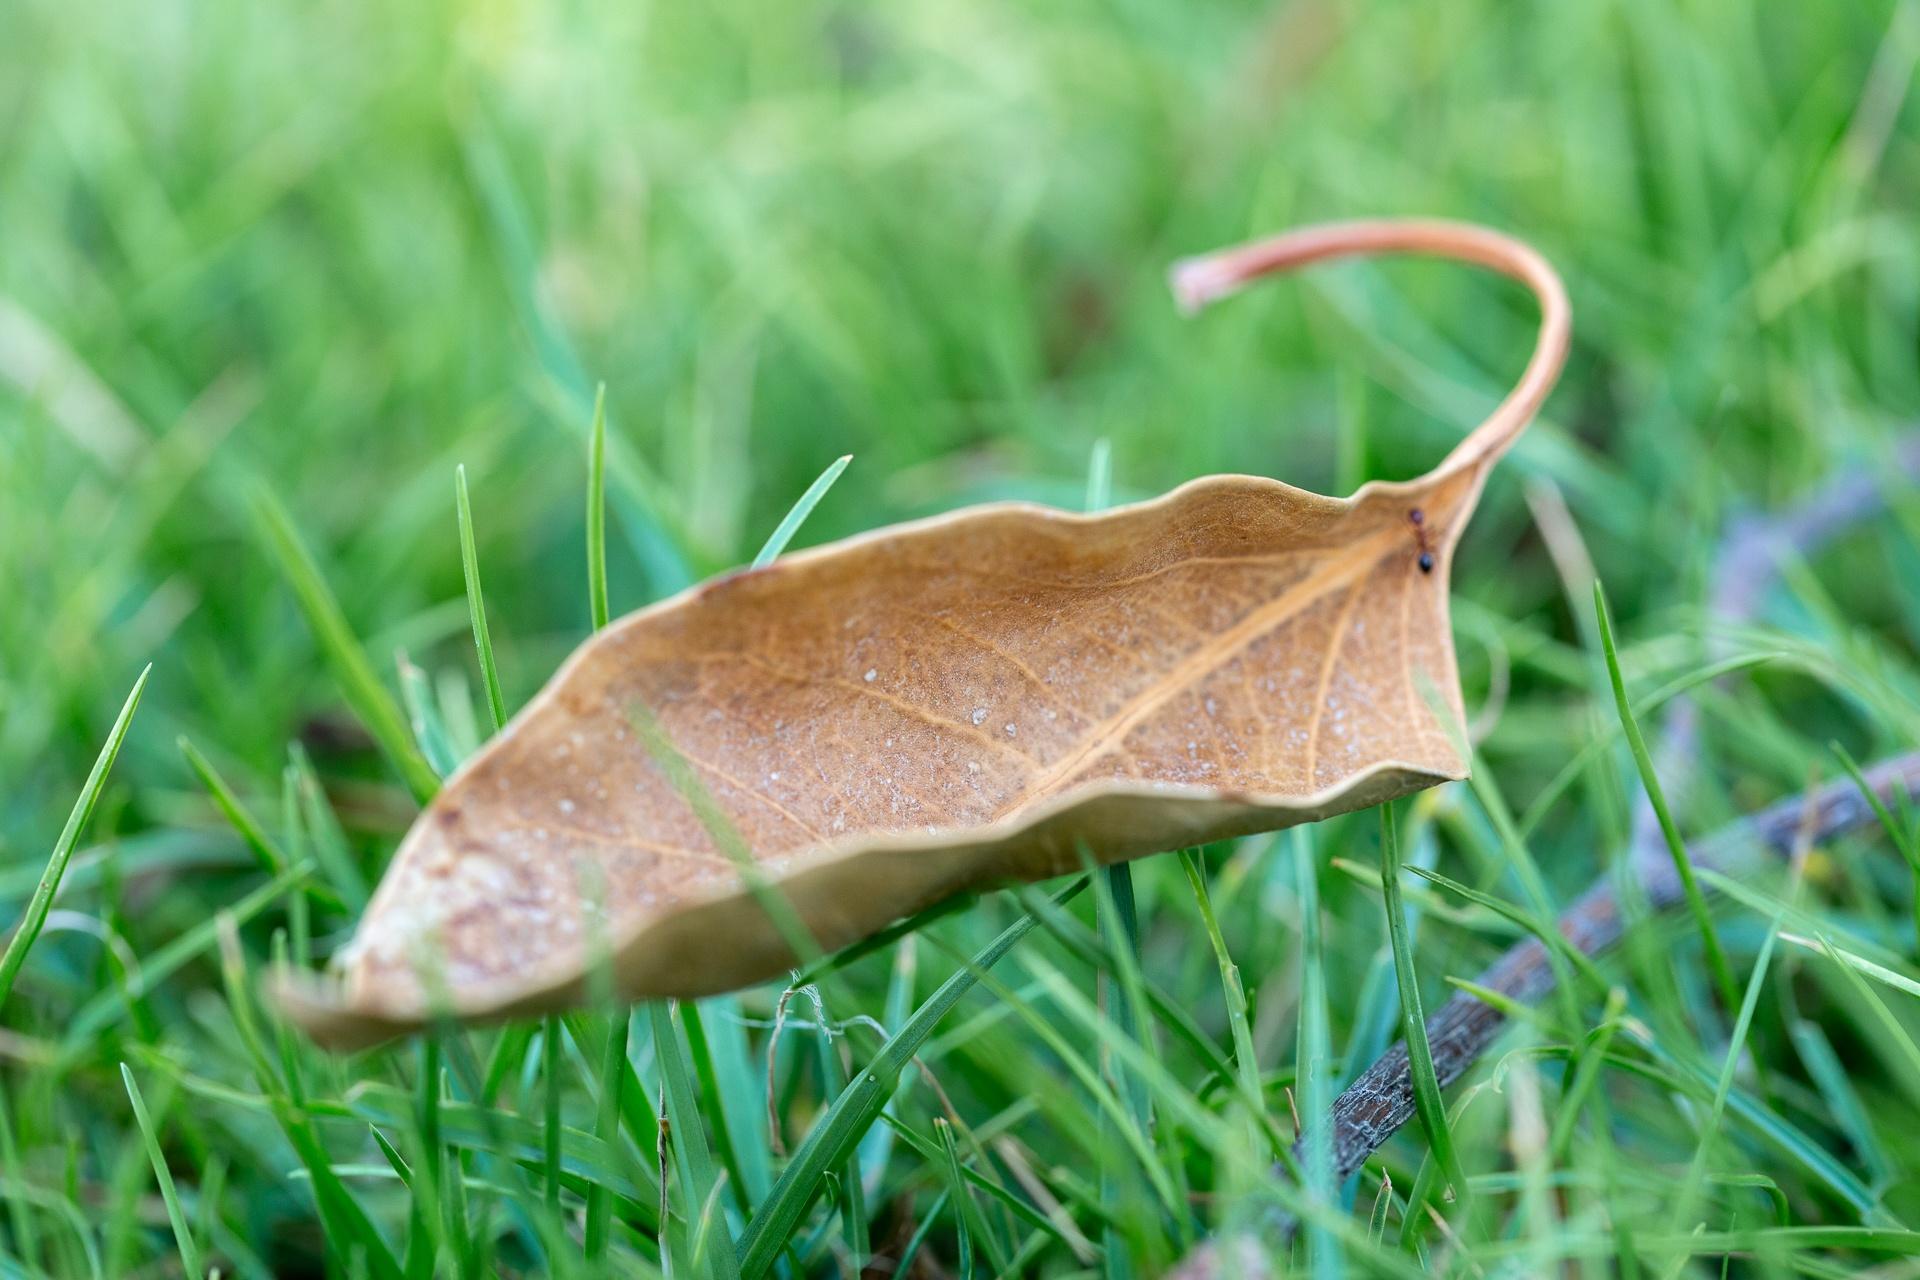 A fallen leaf 'floating' on grass